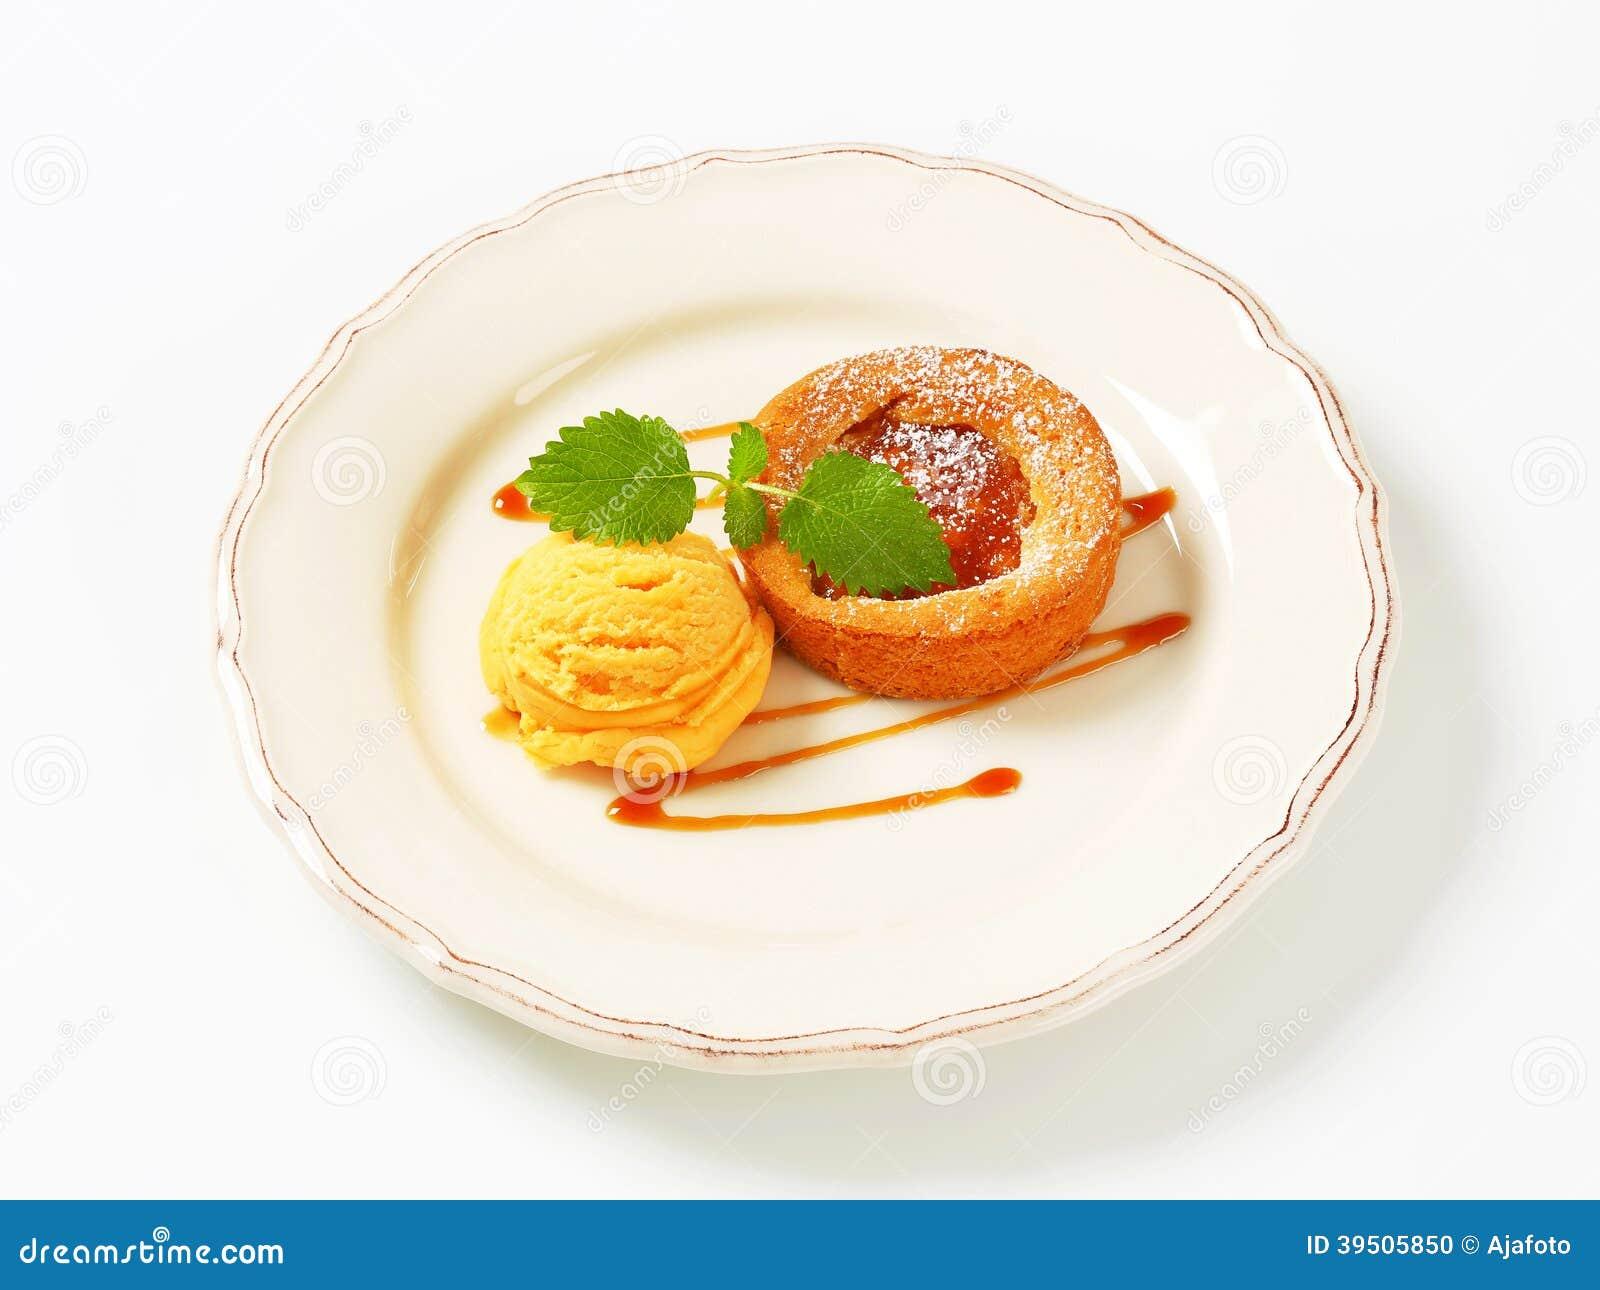 Mini Apple Tart With Ice Cream Stock Photo - Image: 39505850